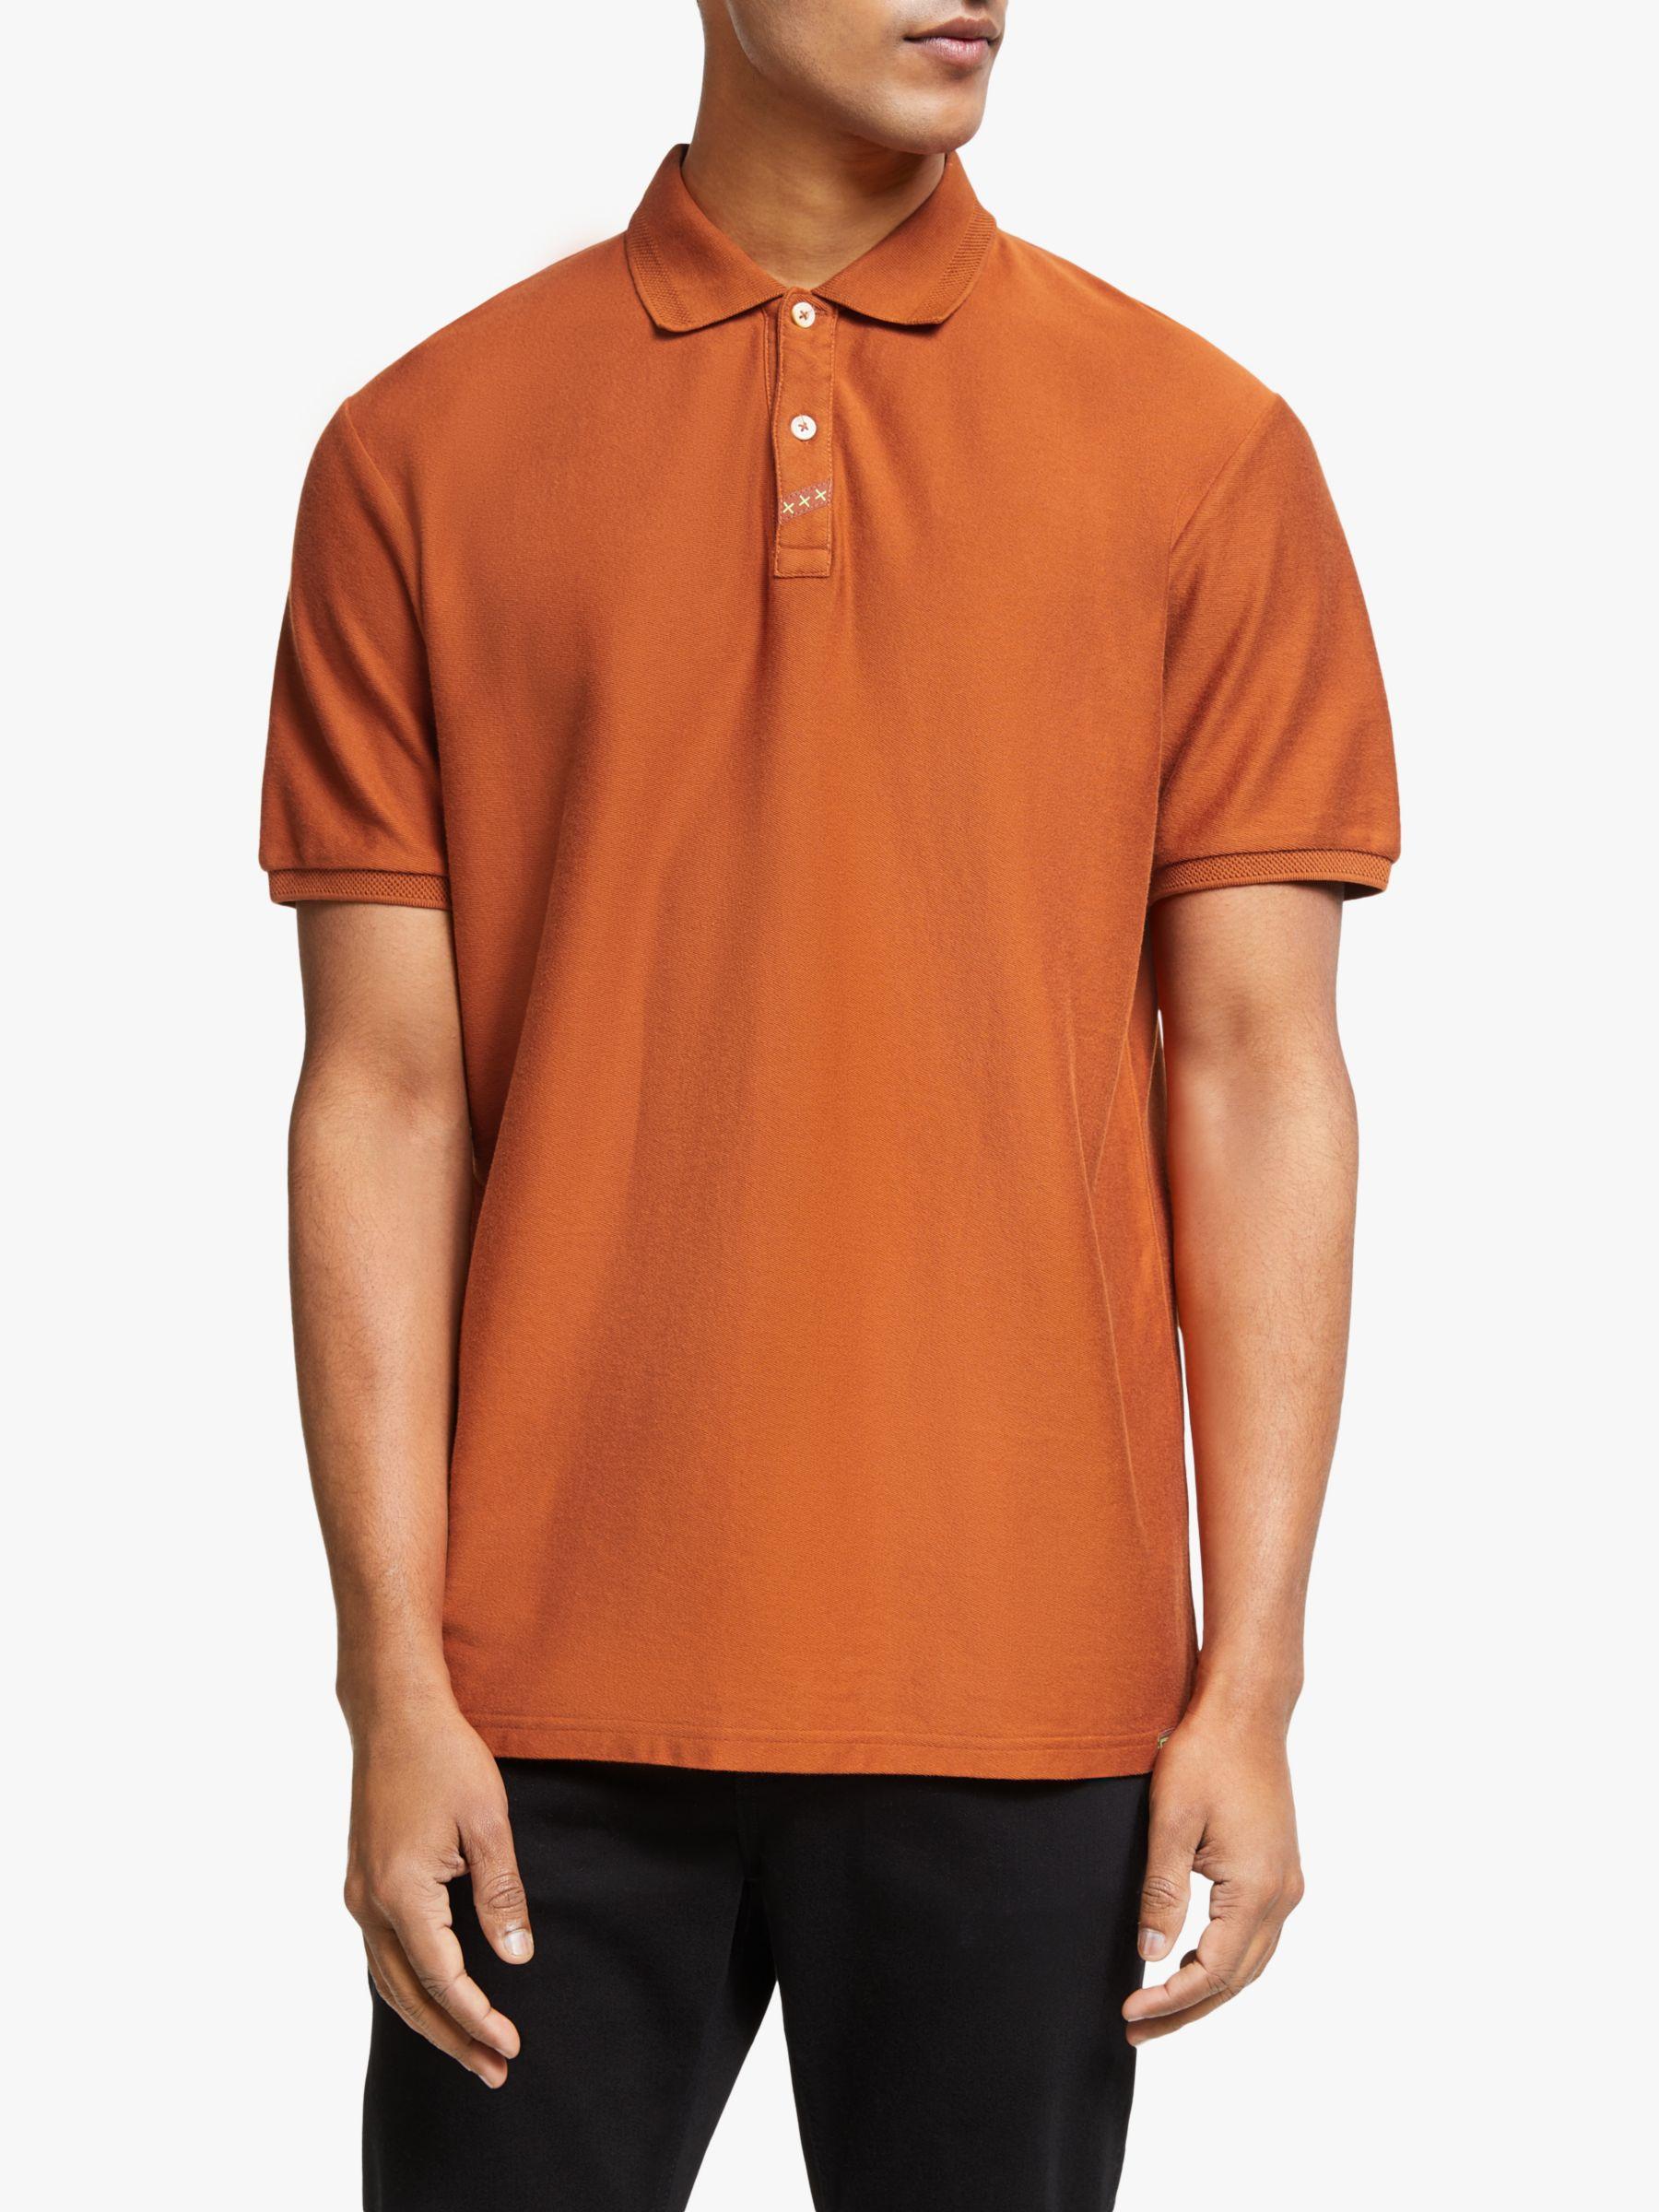 Scotch & Soda Scotch & Soda Short Sleeve Polo Shirt, Urban Rust